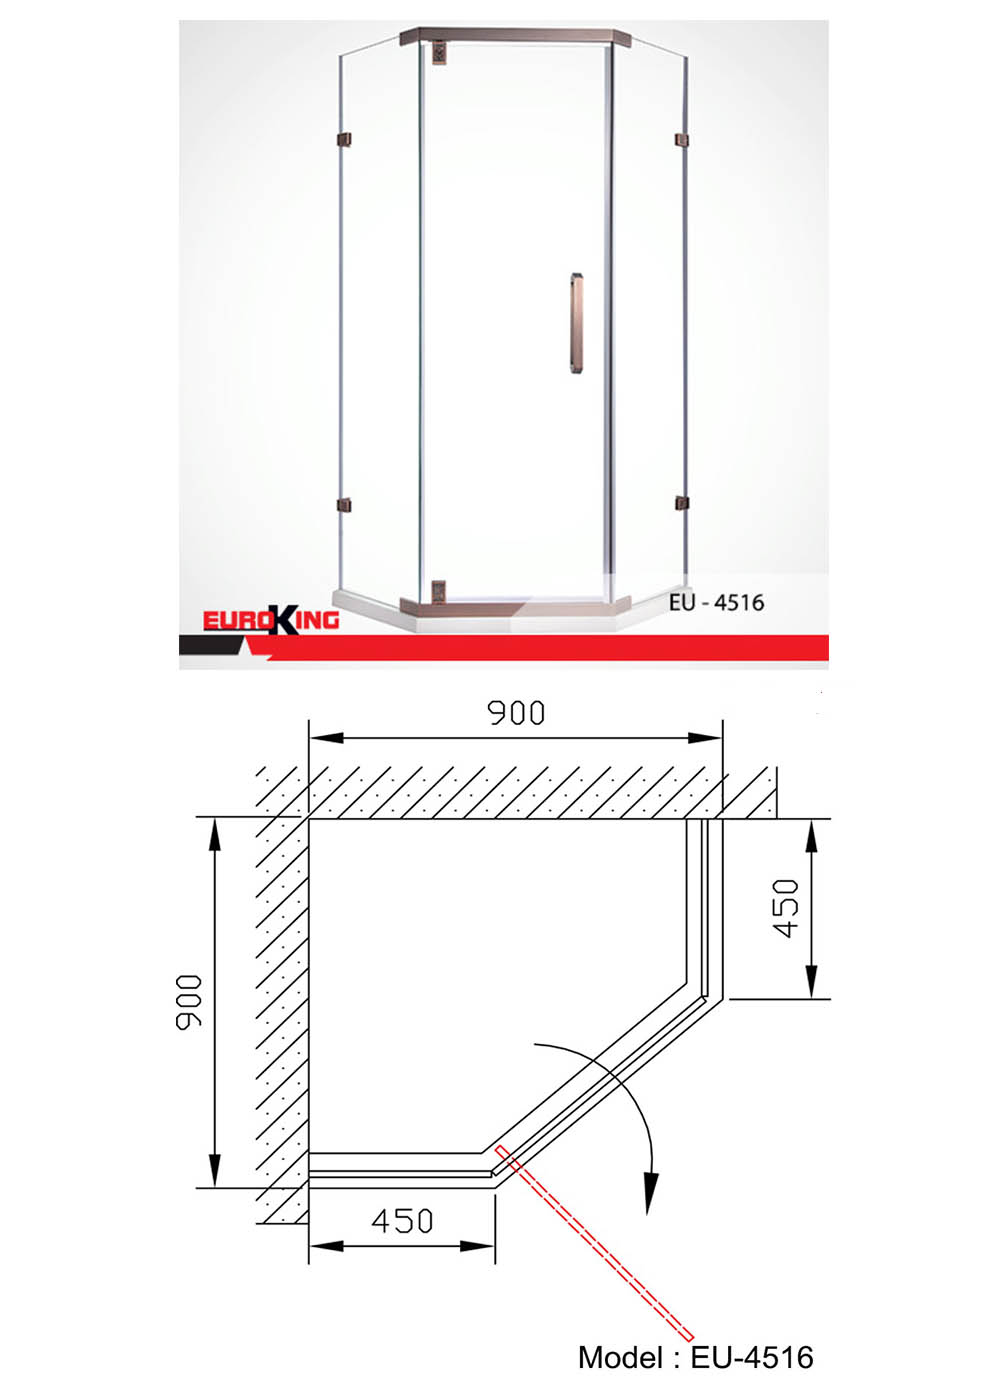 Bảng vẽ kỹ thuật EU-4516